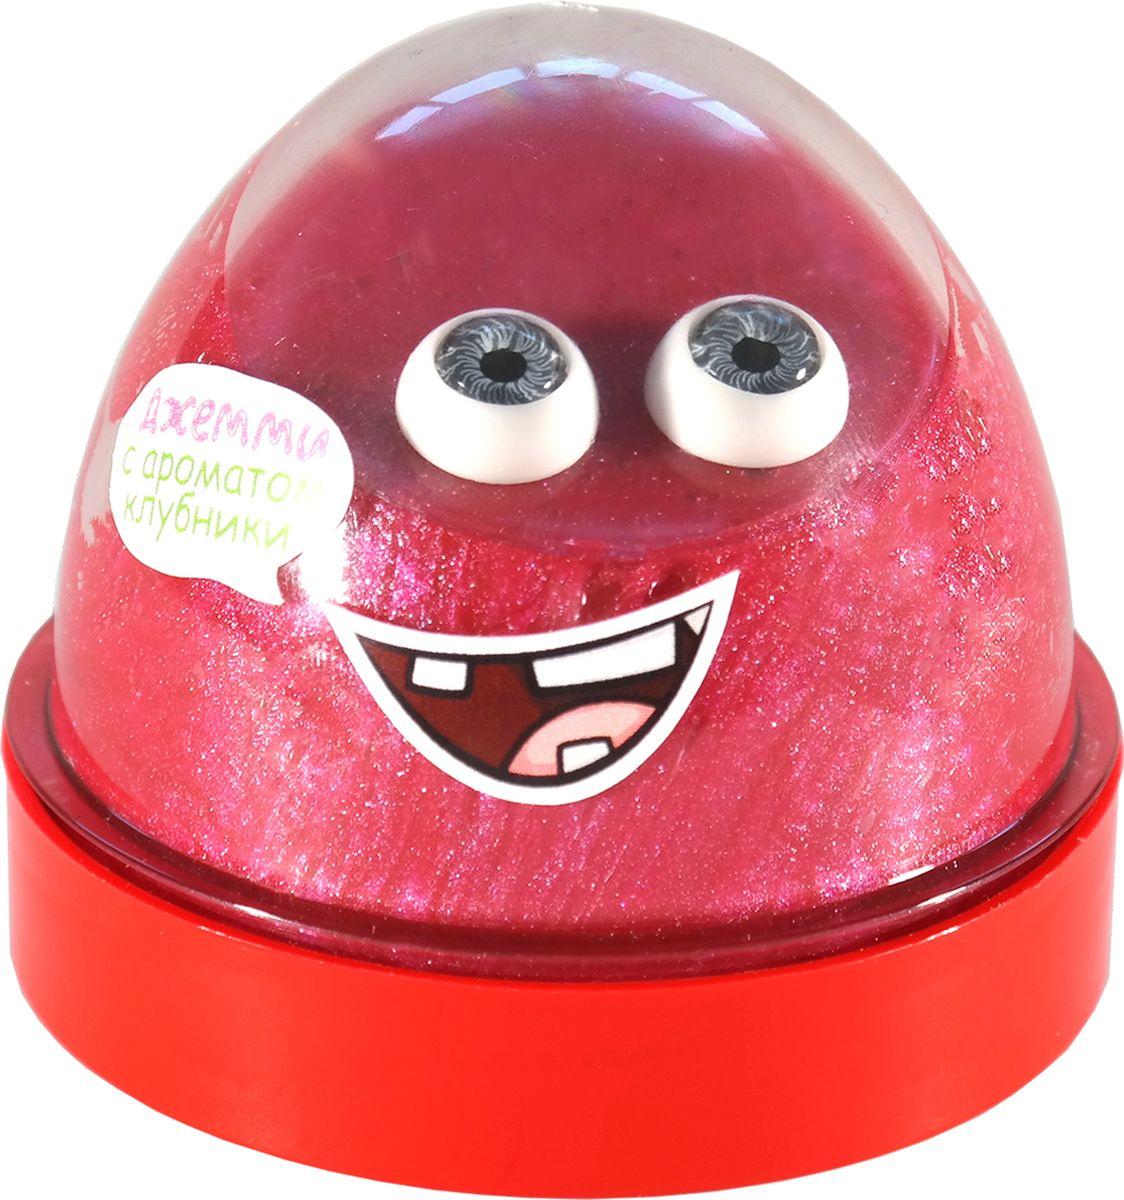 Nnano Gum Жвачка для рук-антистресс Джемми с ароматом клубники 50 гр nano gum зеленое яблоко 25 гр с ароматом яблока